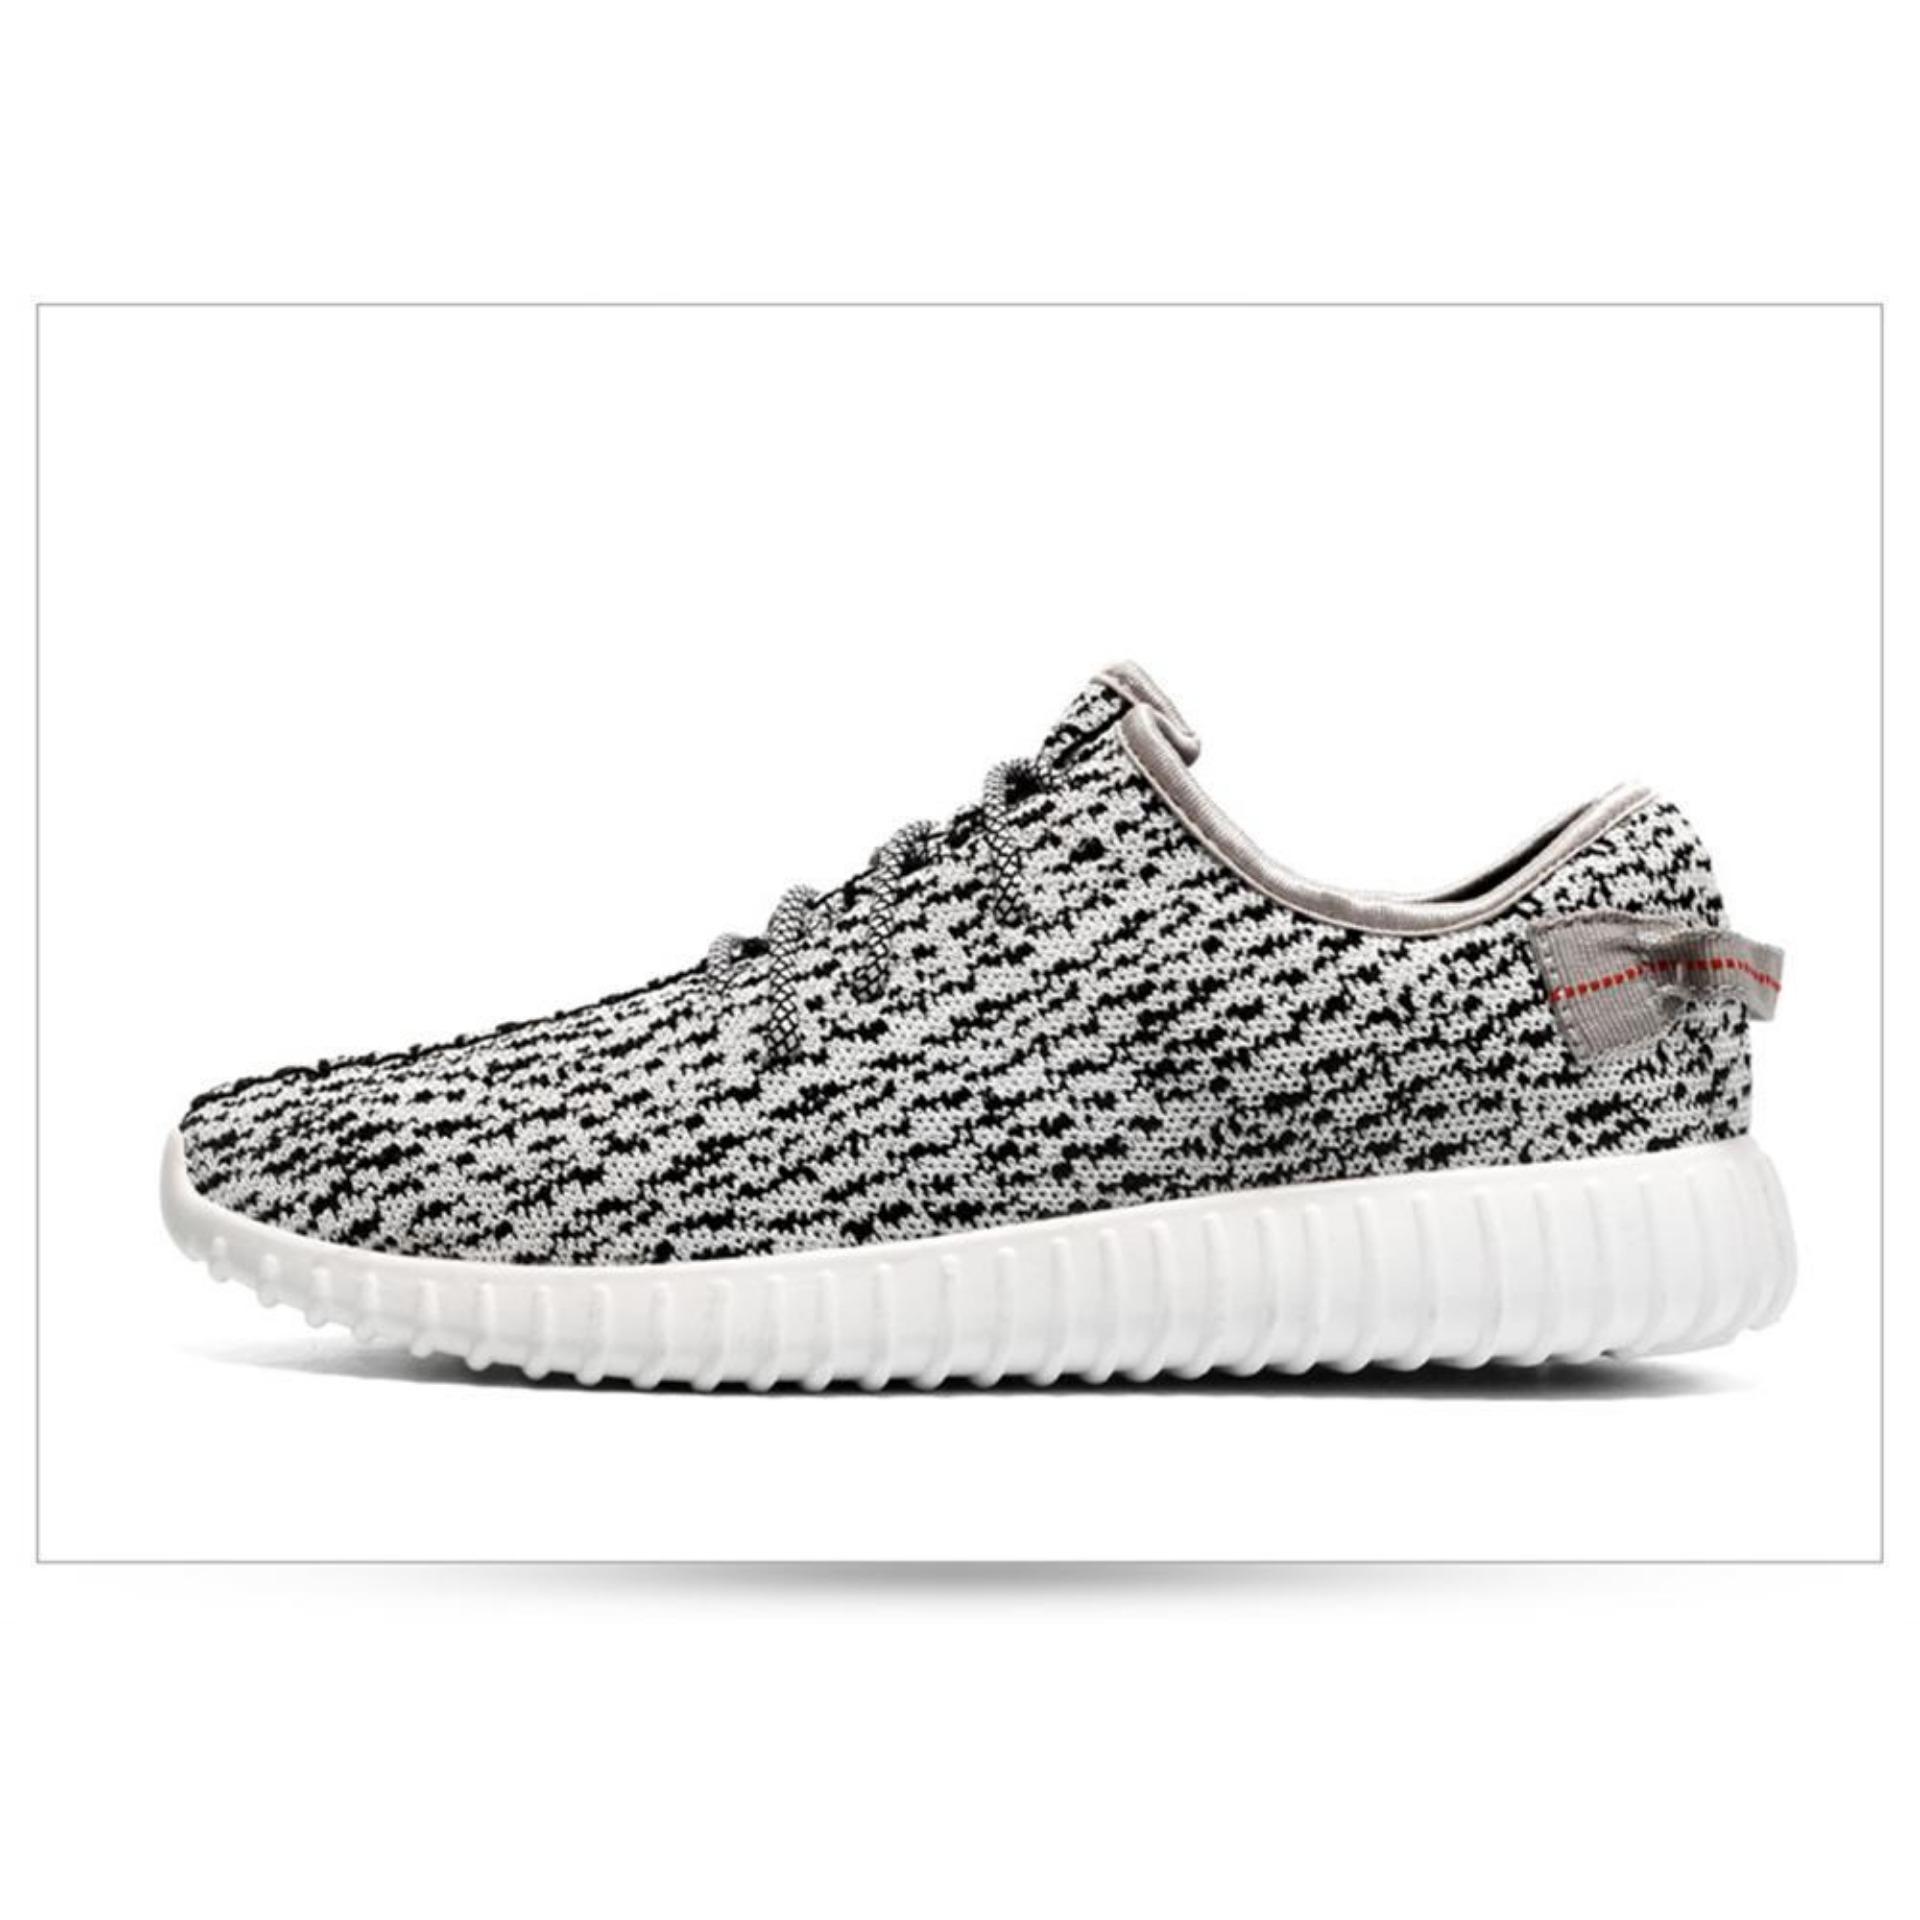 Sepatu Kets Running Bellio736 Hitam Polos - Wikie Cloud Design Ideas b6cba30763